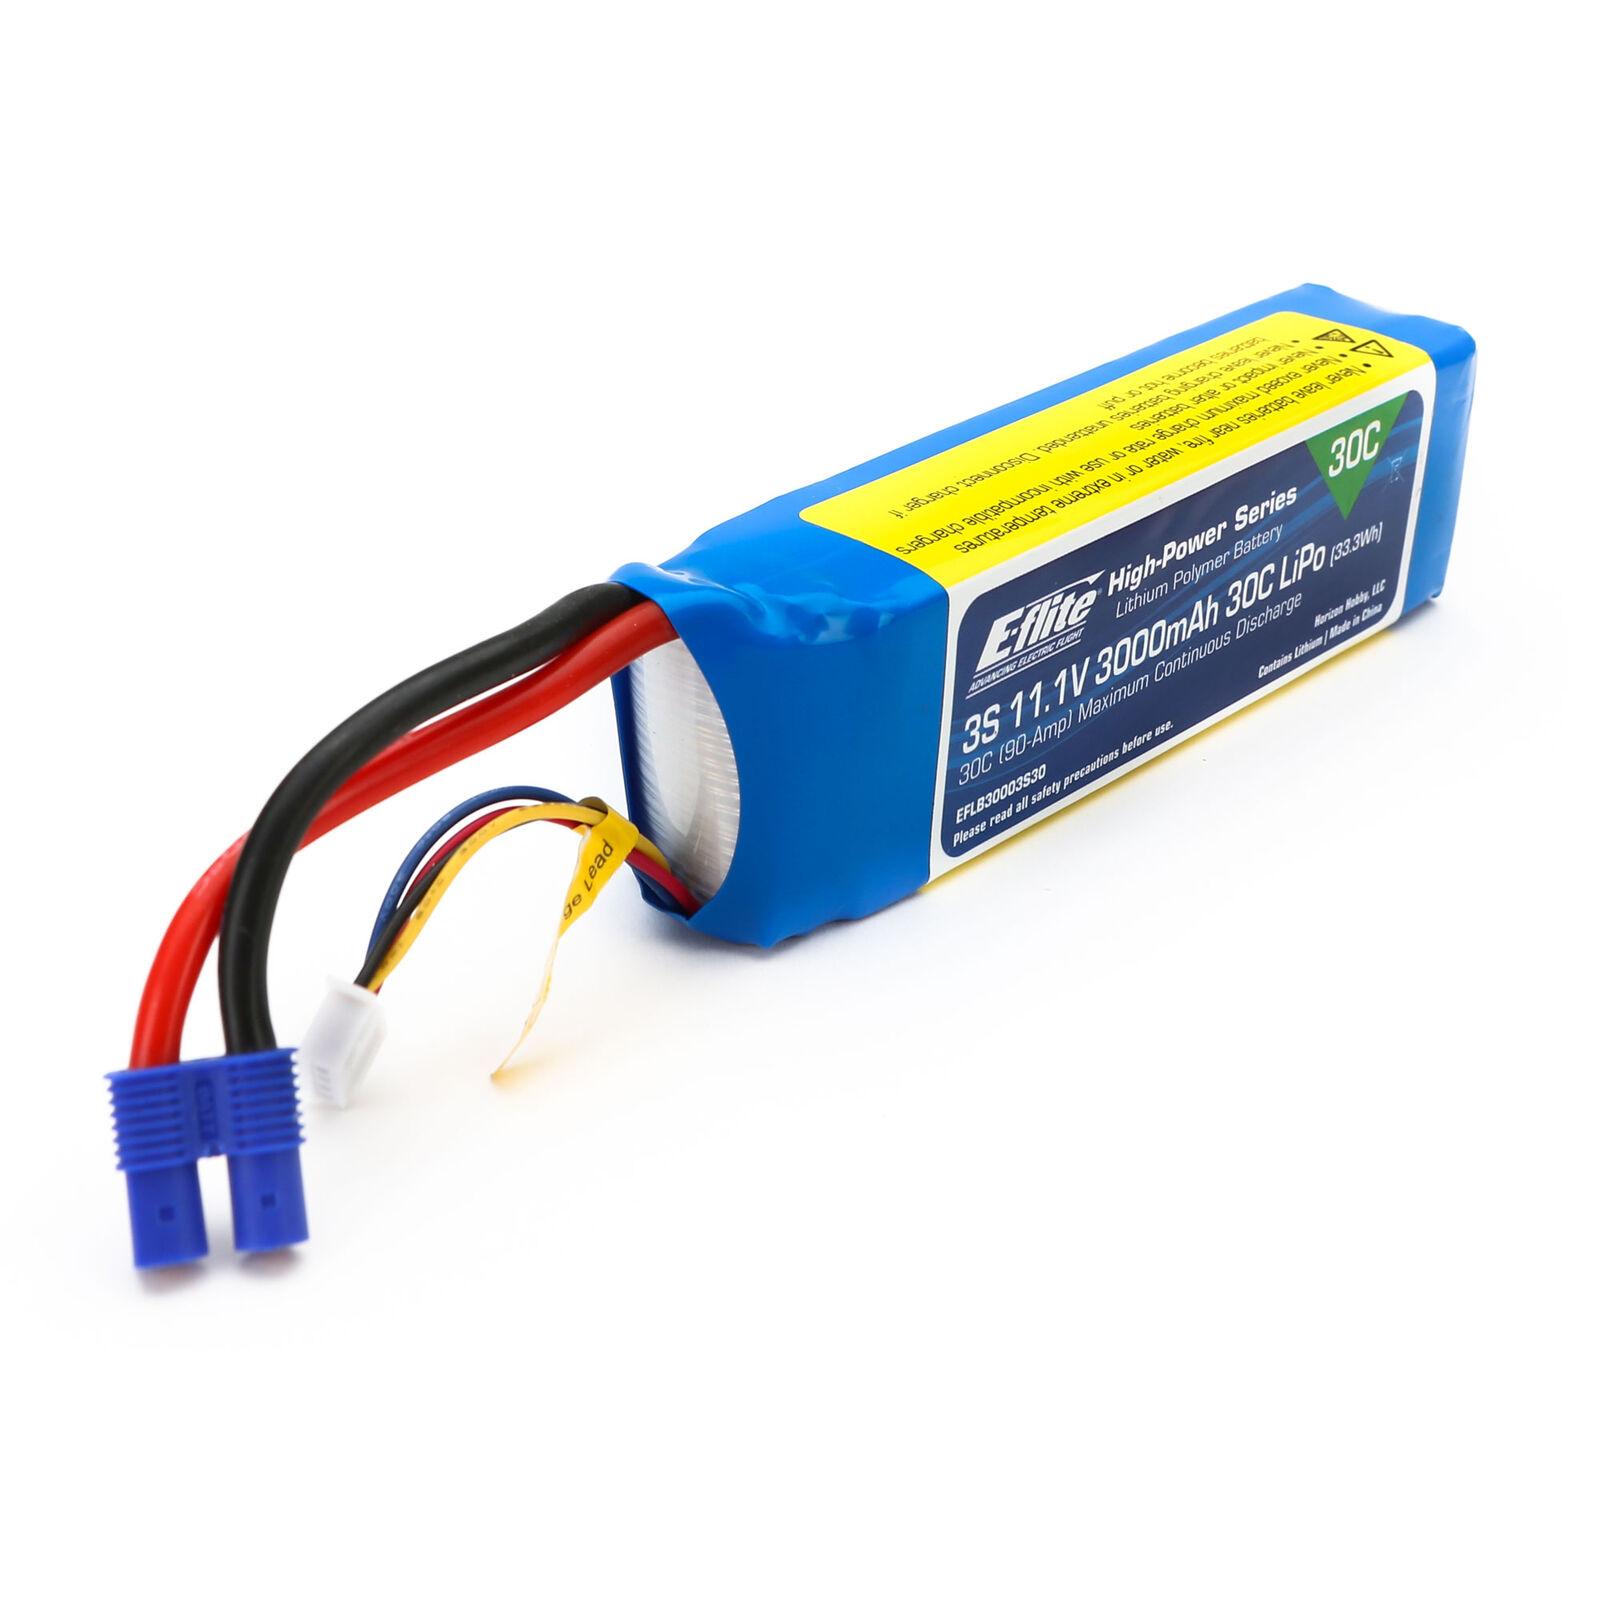 11.1V 3000mAh 3S 30C LiPo Battery: EC3